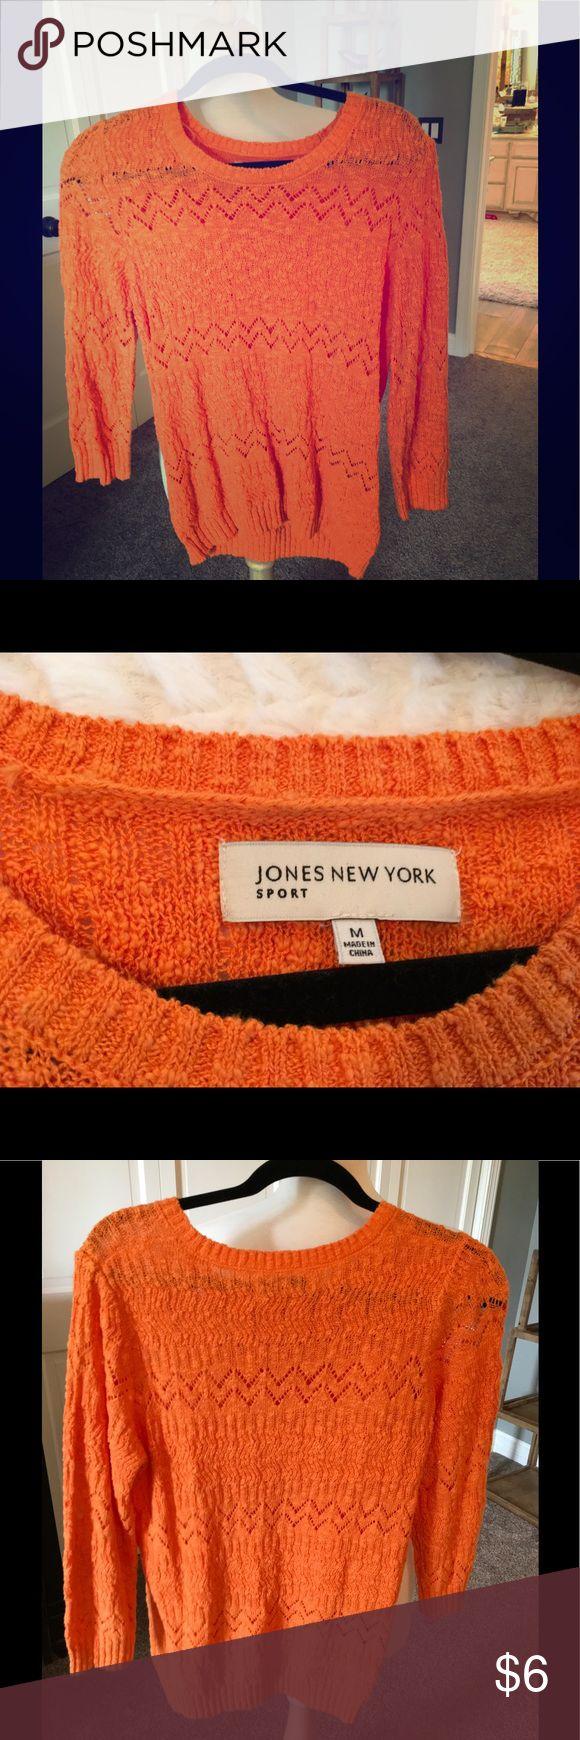 Jones New York orange sweater Never worn crew neck sweater Sweaters